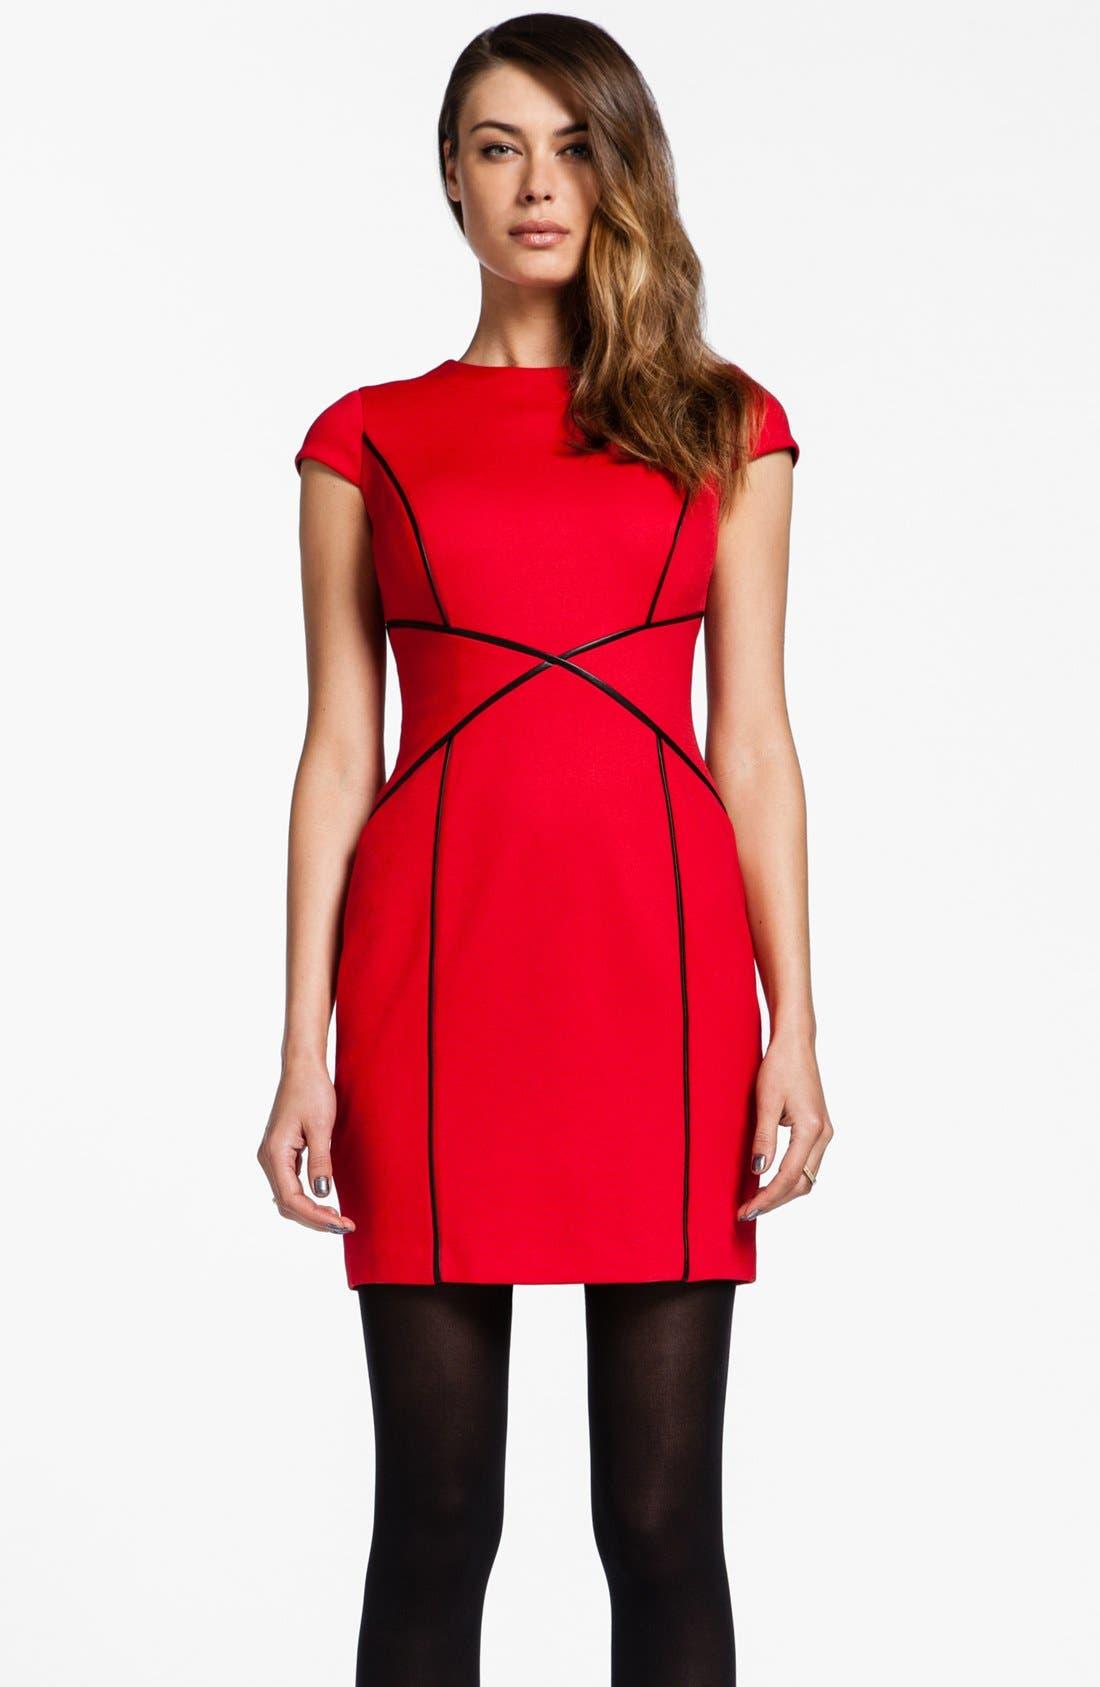 Alternate Image 1 Selected - Cynthia Steffe 'Bristol' Faux Leather Trim Sheath Dress